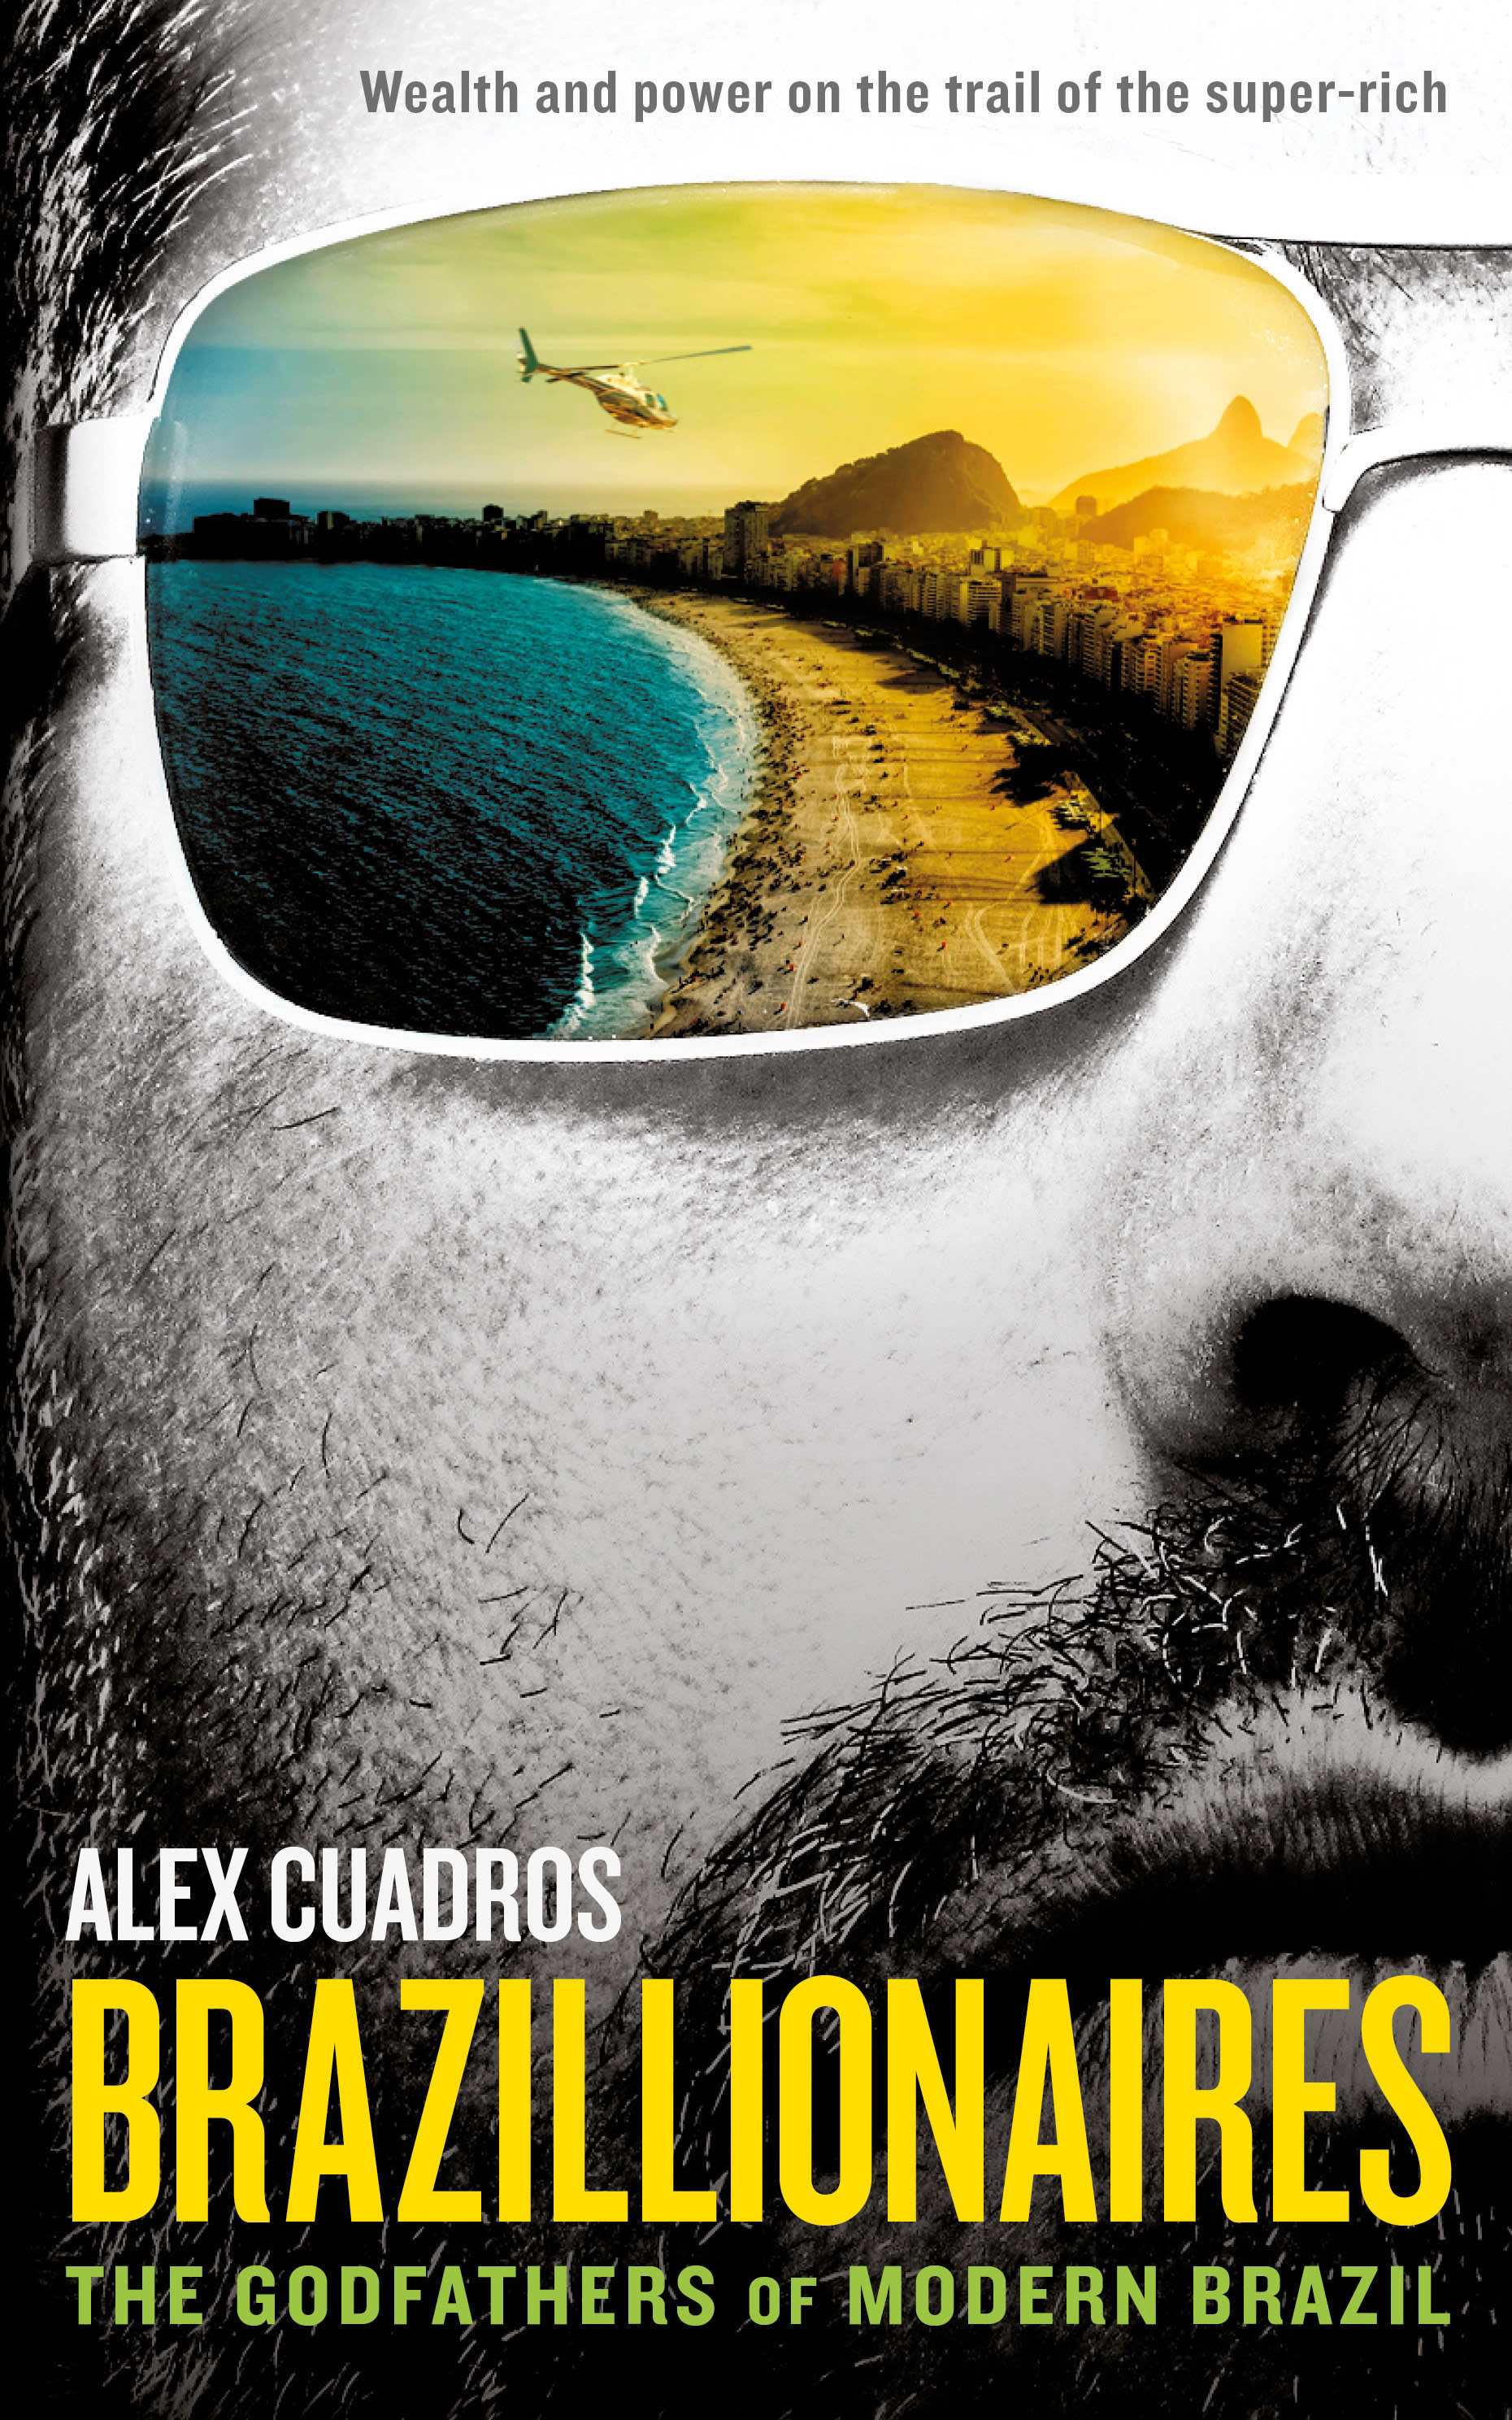 Brazillionaires by Alex Cuadros